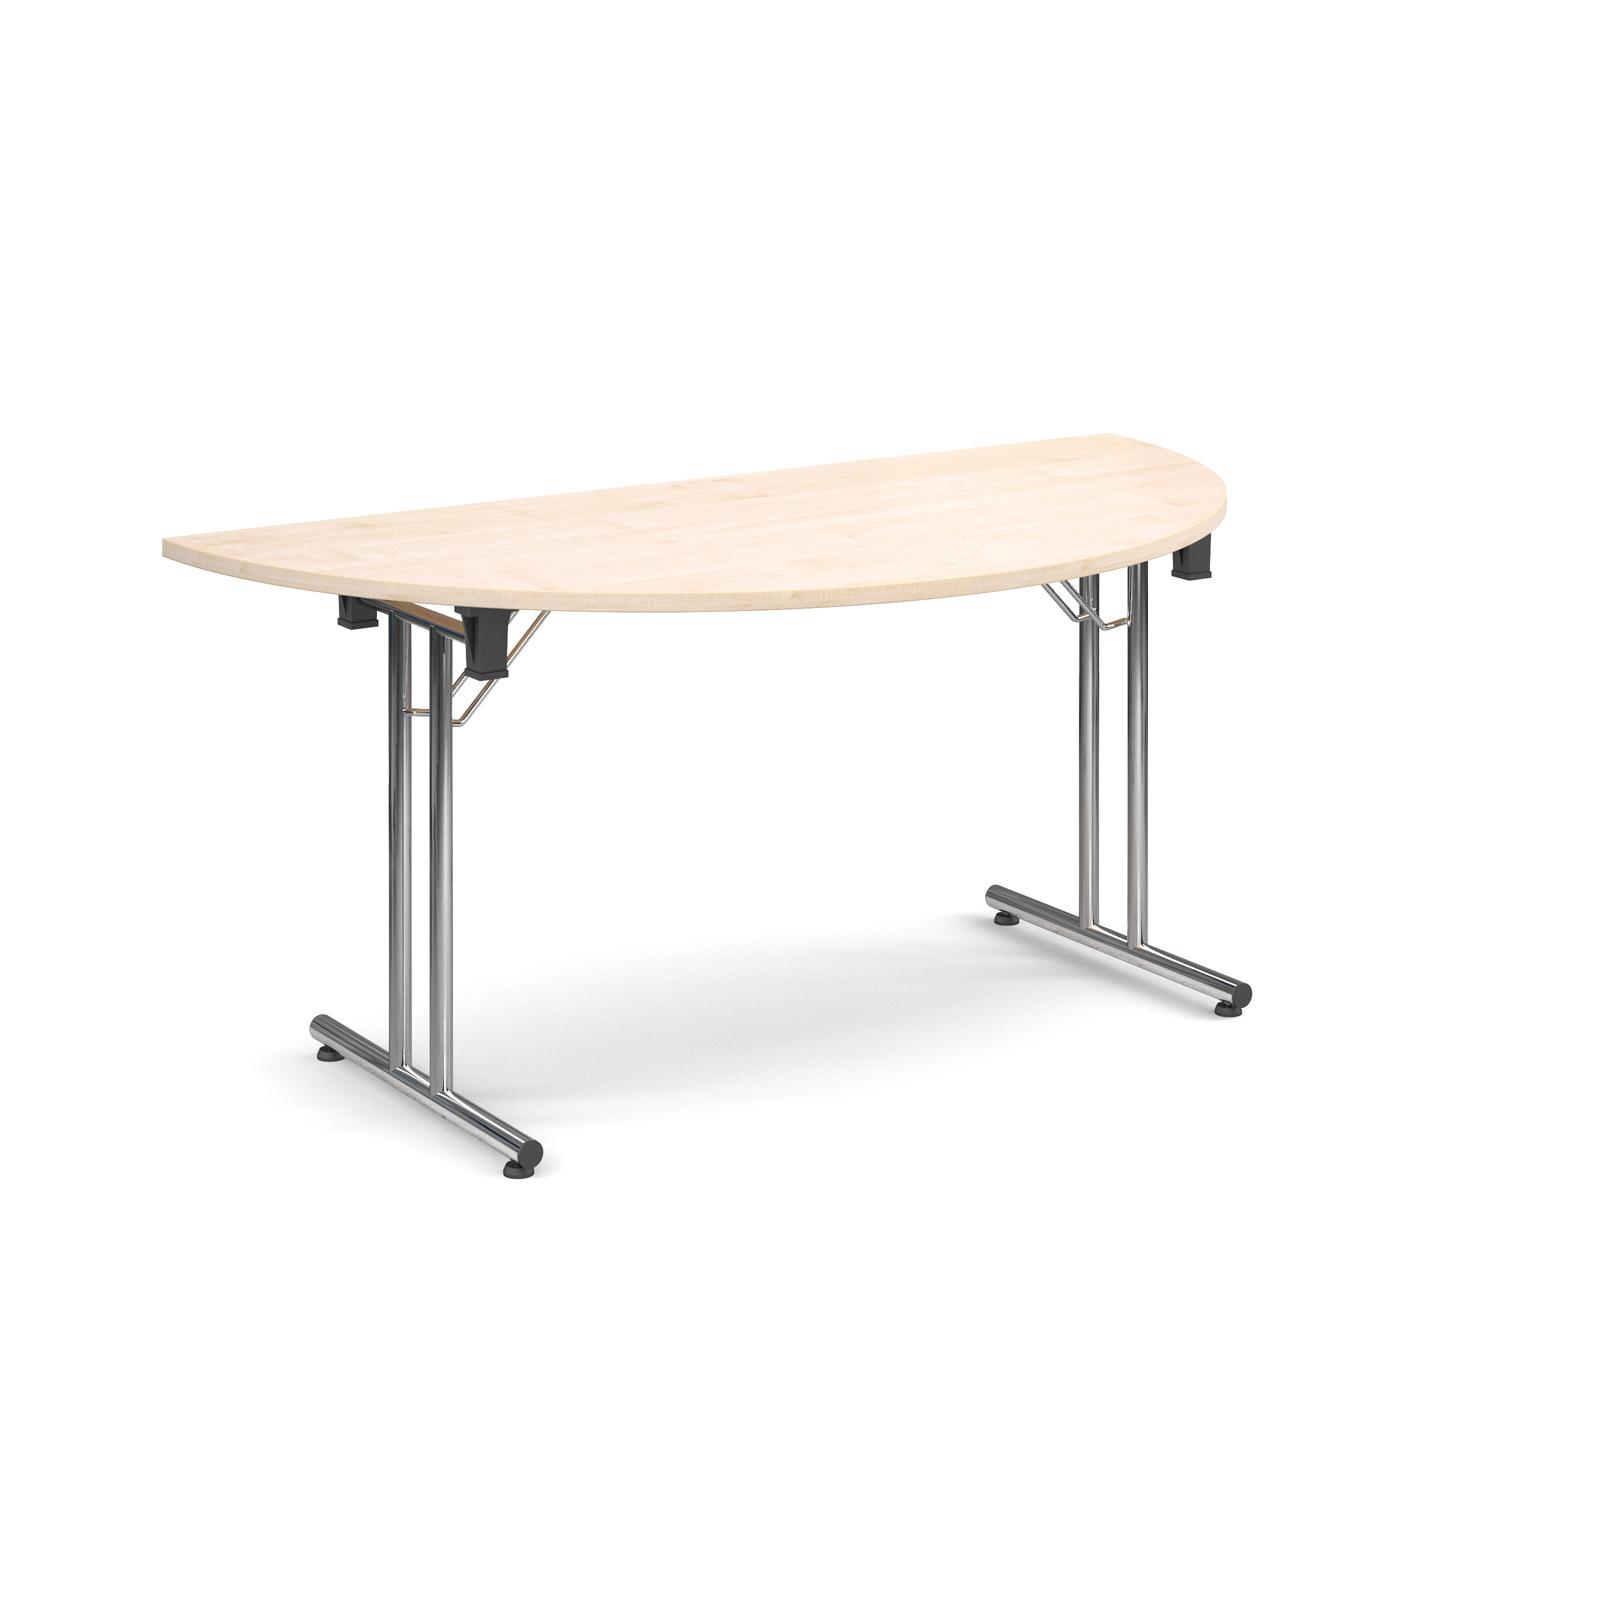 Semi circular deluxe folding leg table 1600mm x 800mm - maple